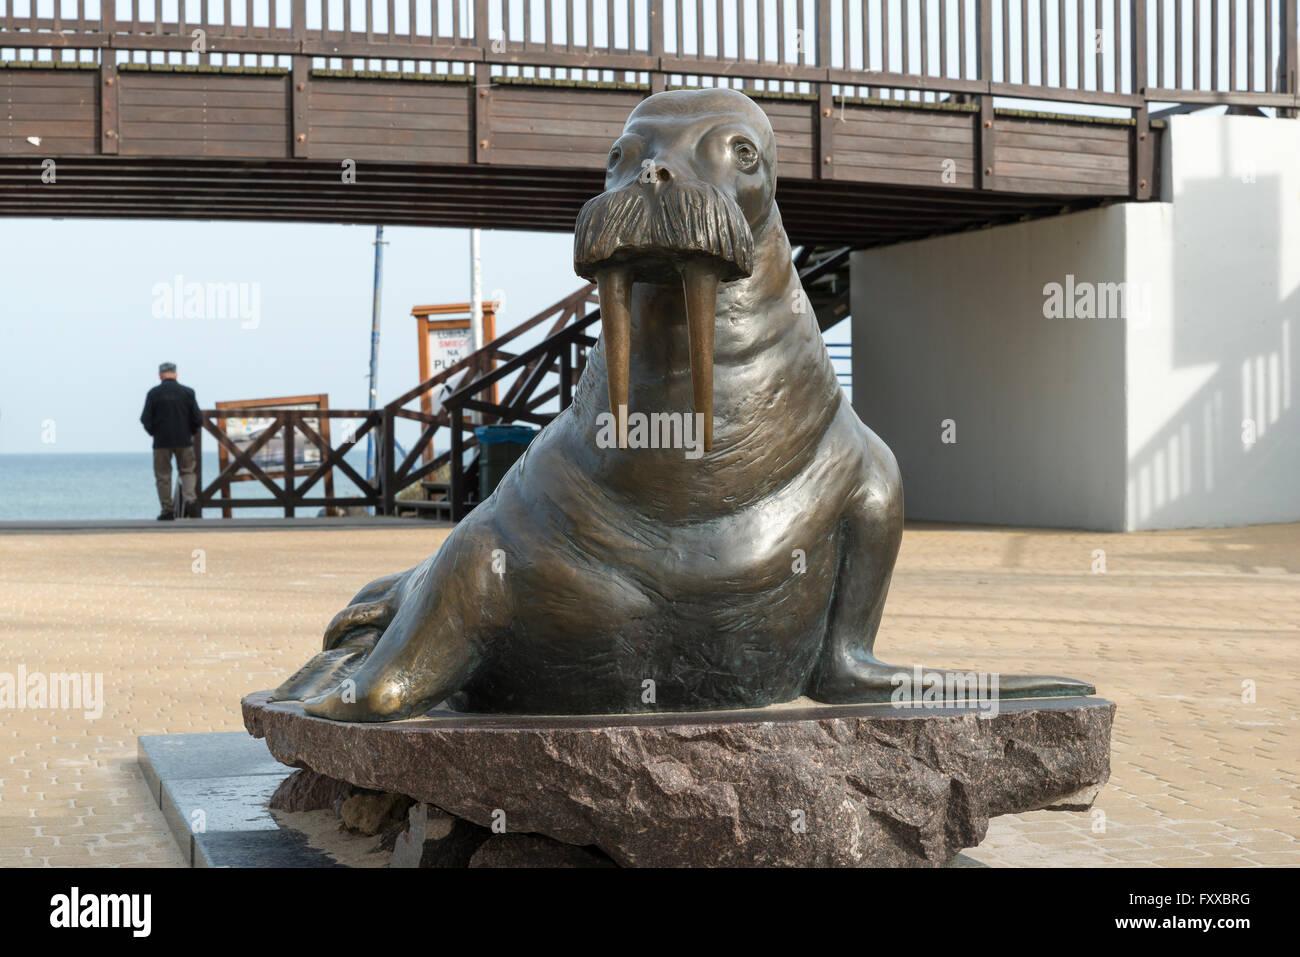 Walrus Statue In Mielno Koszalin County West Pomeranian Stock